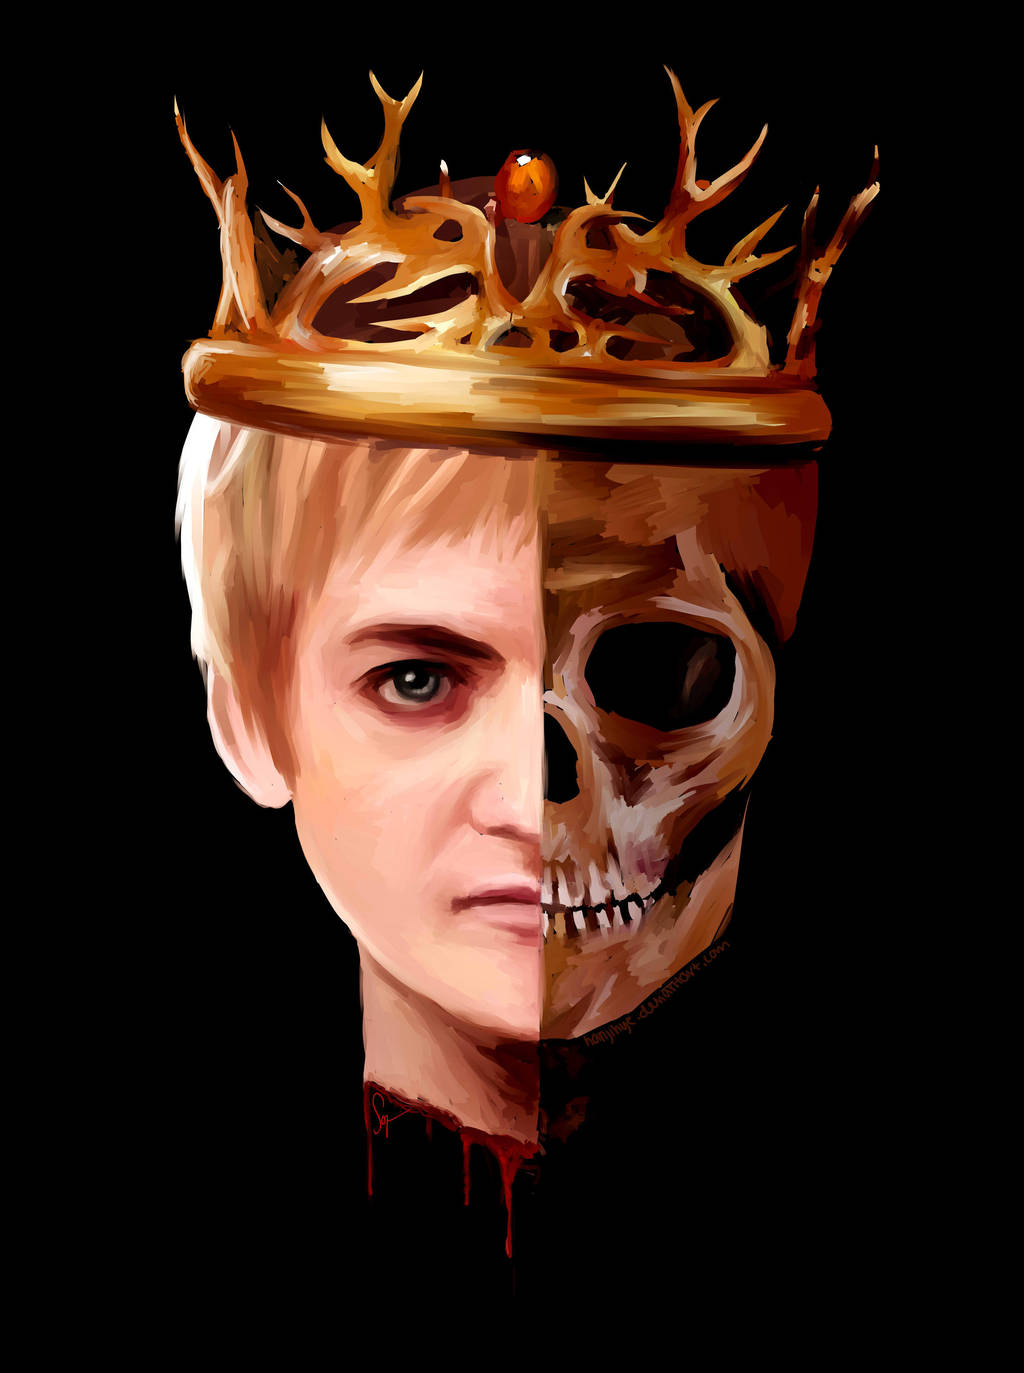 Long Live The King by HaNJiHye